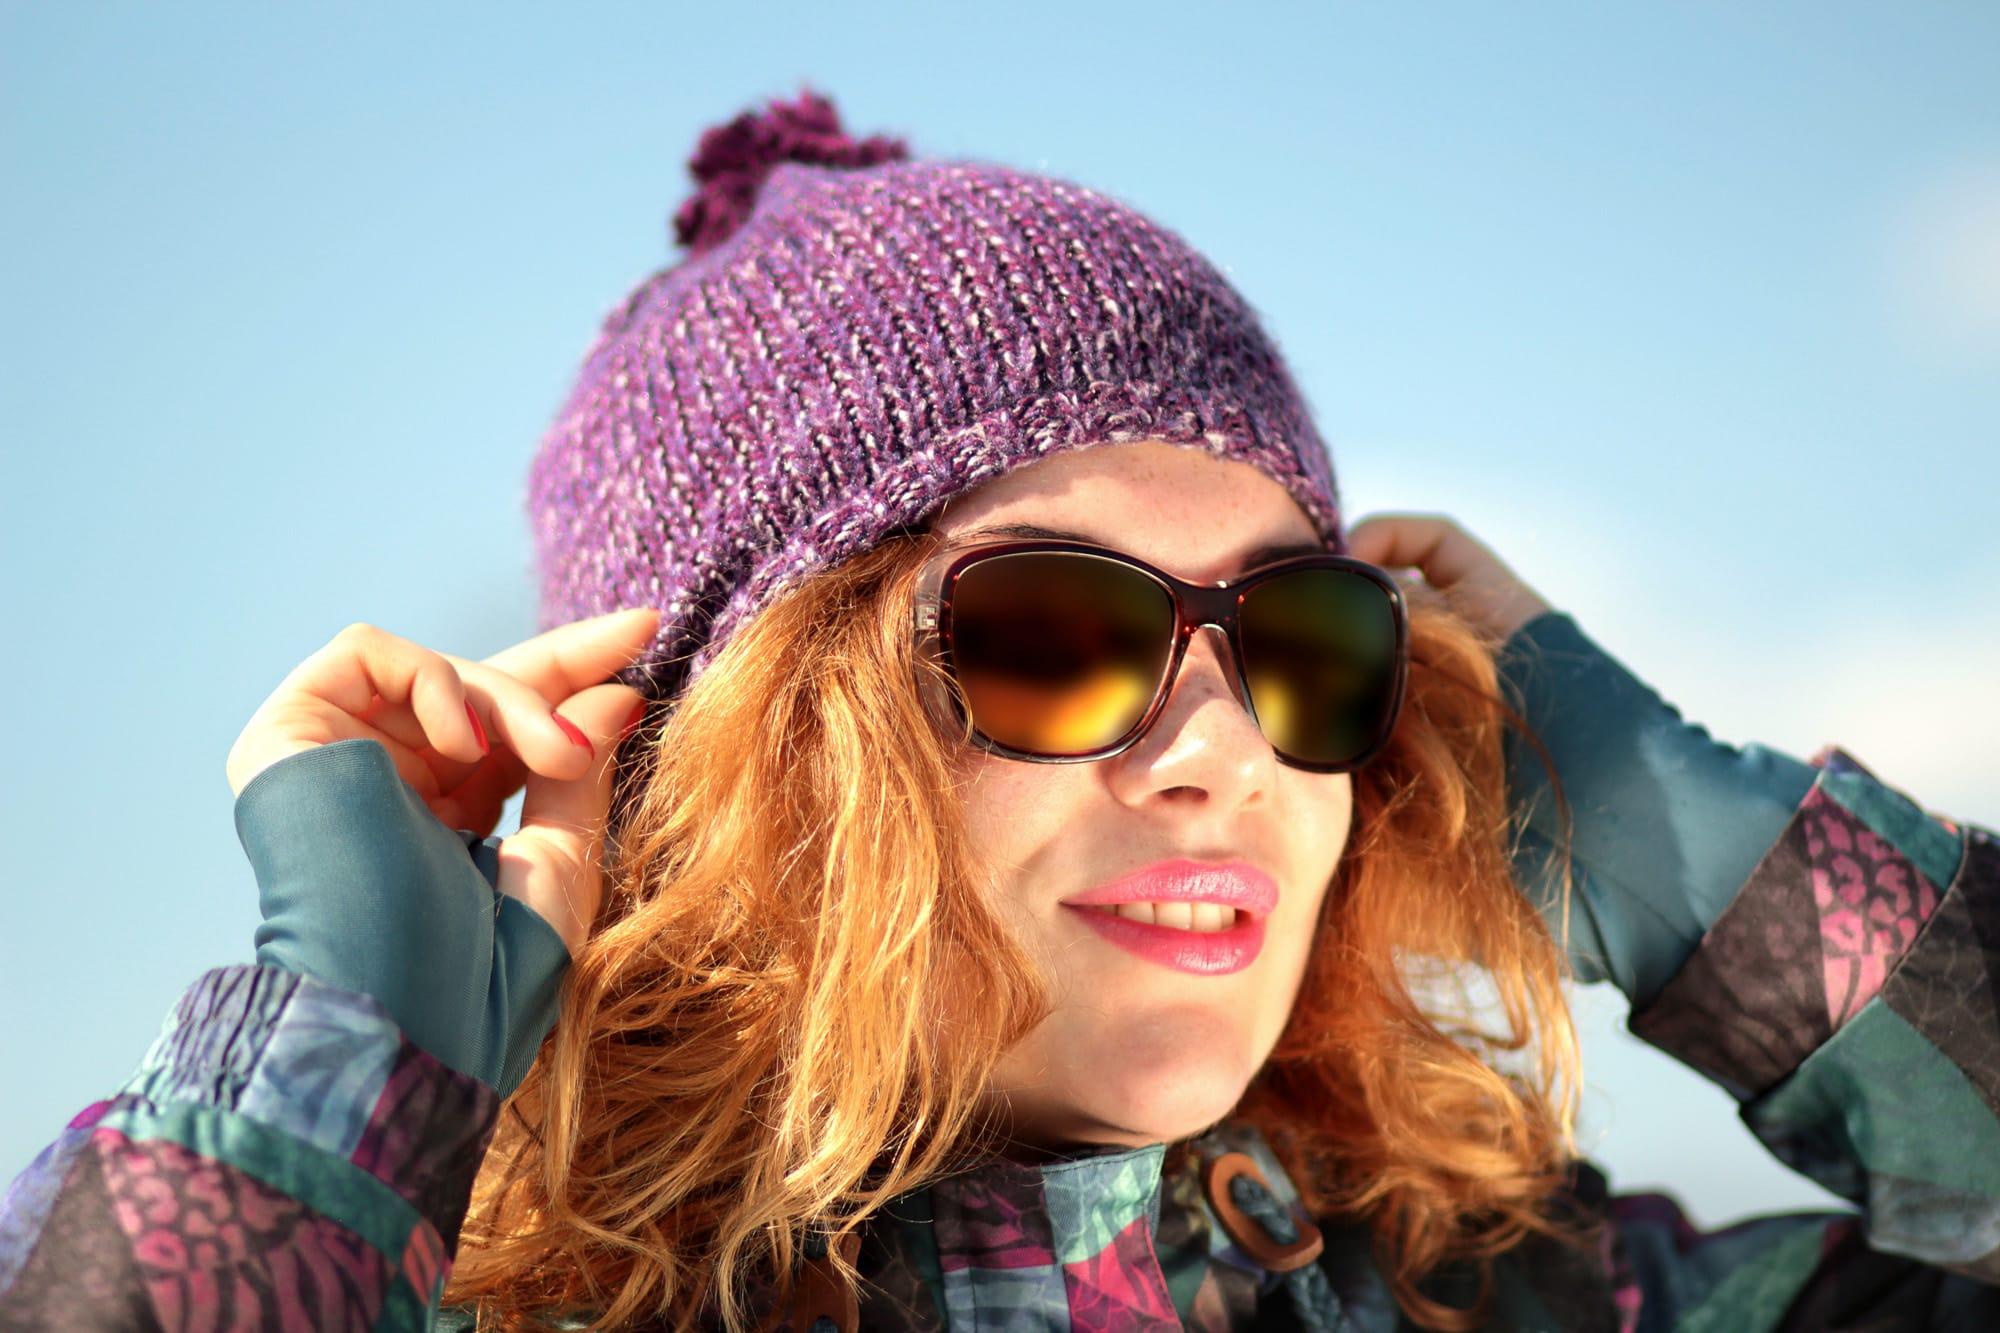 Phoenix Optometrists Recommend Wearing Sunglasses Year-Round